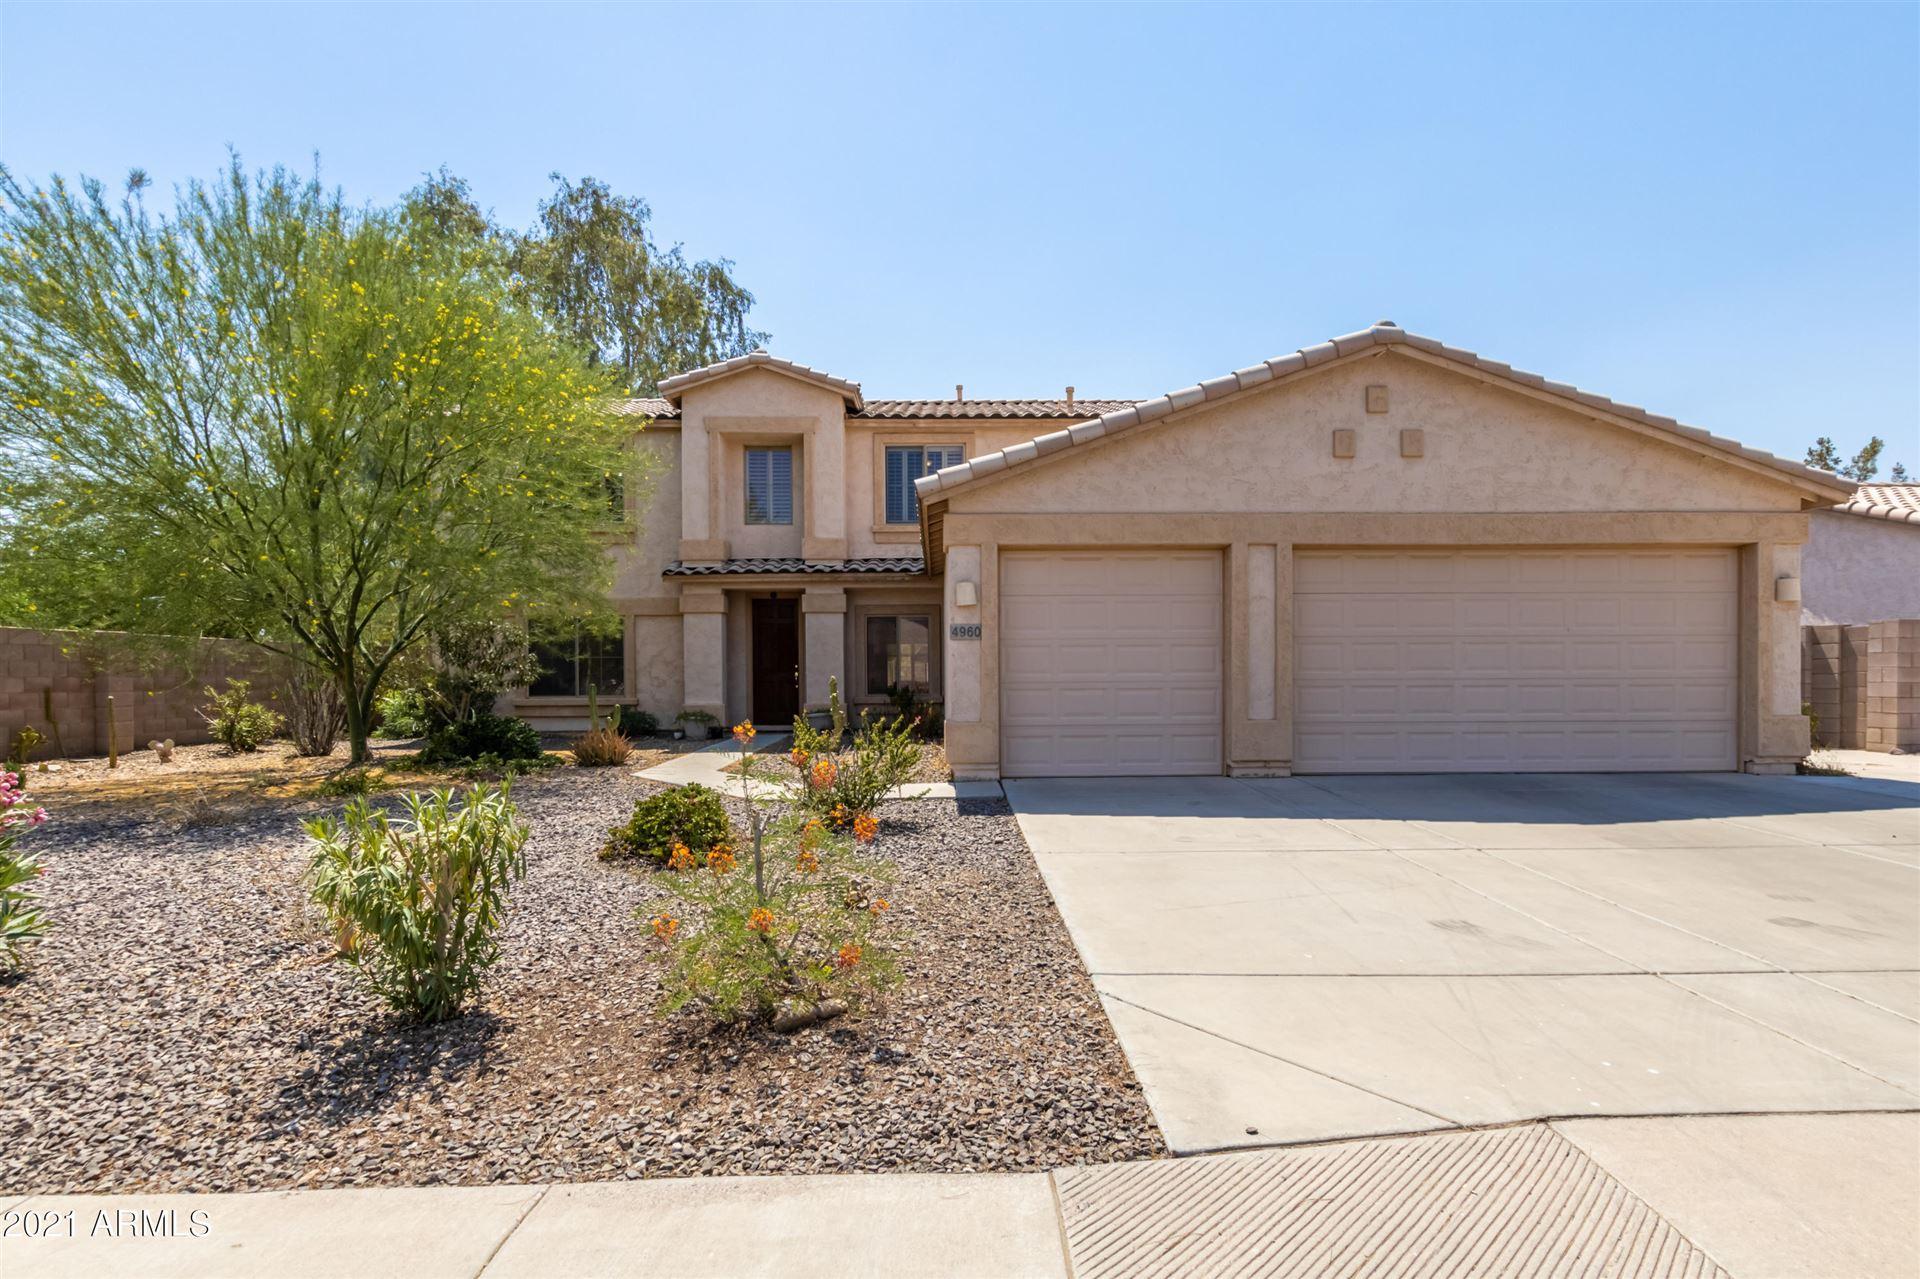 4960 S SPRINGS Drive, Chandler, AZ 85249 - MLS#: 6253902